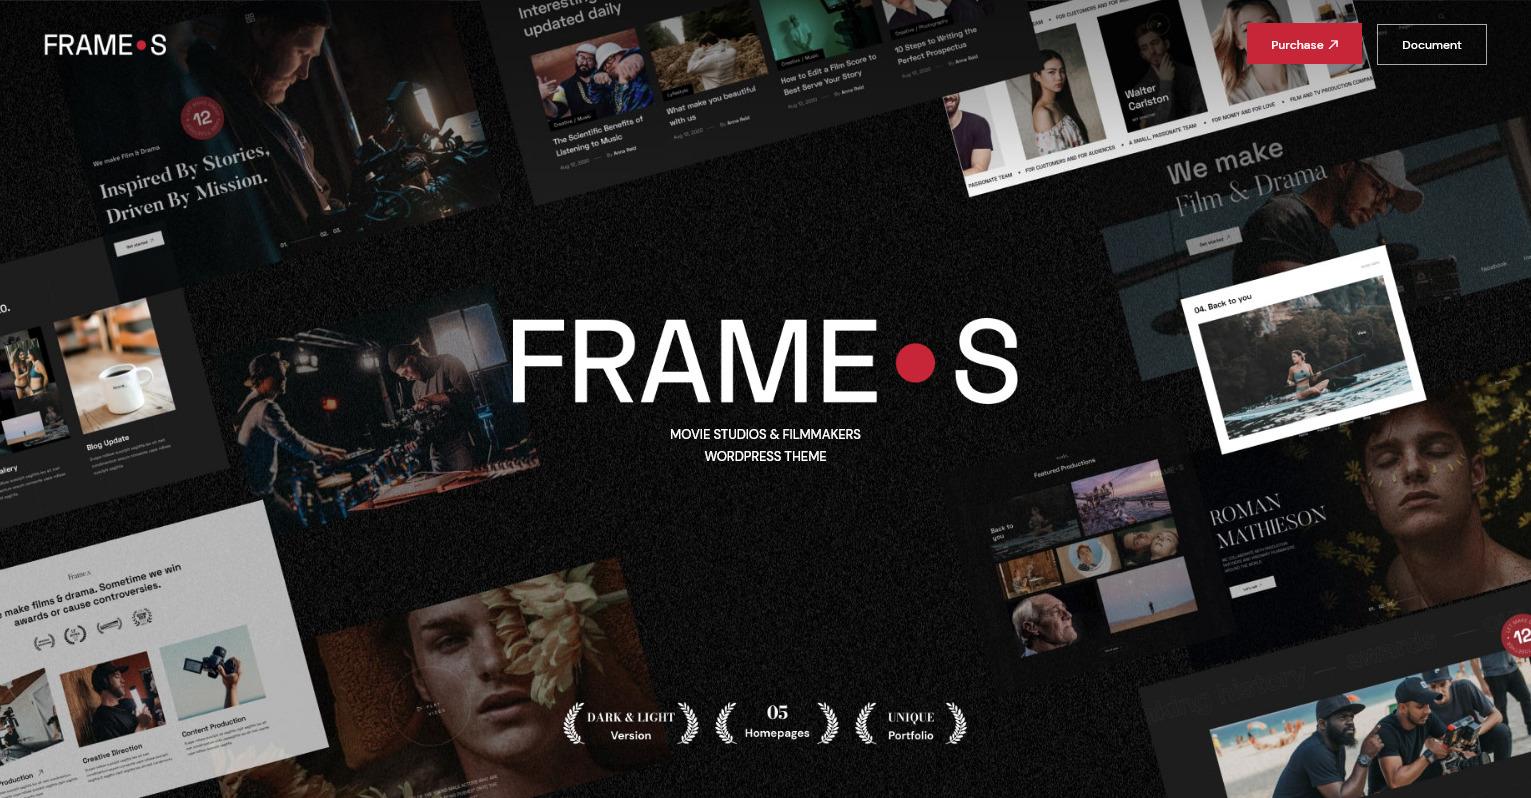 Frames Movie Studio and Filmmaker WordPress Theme